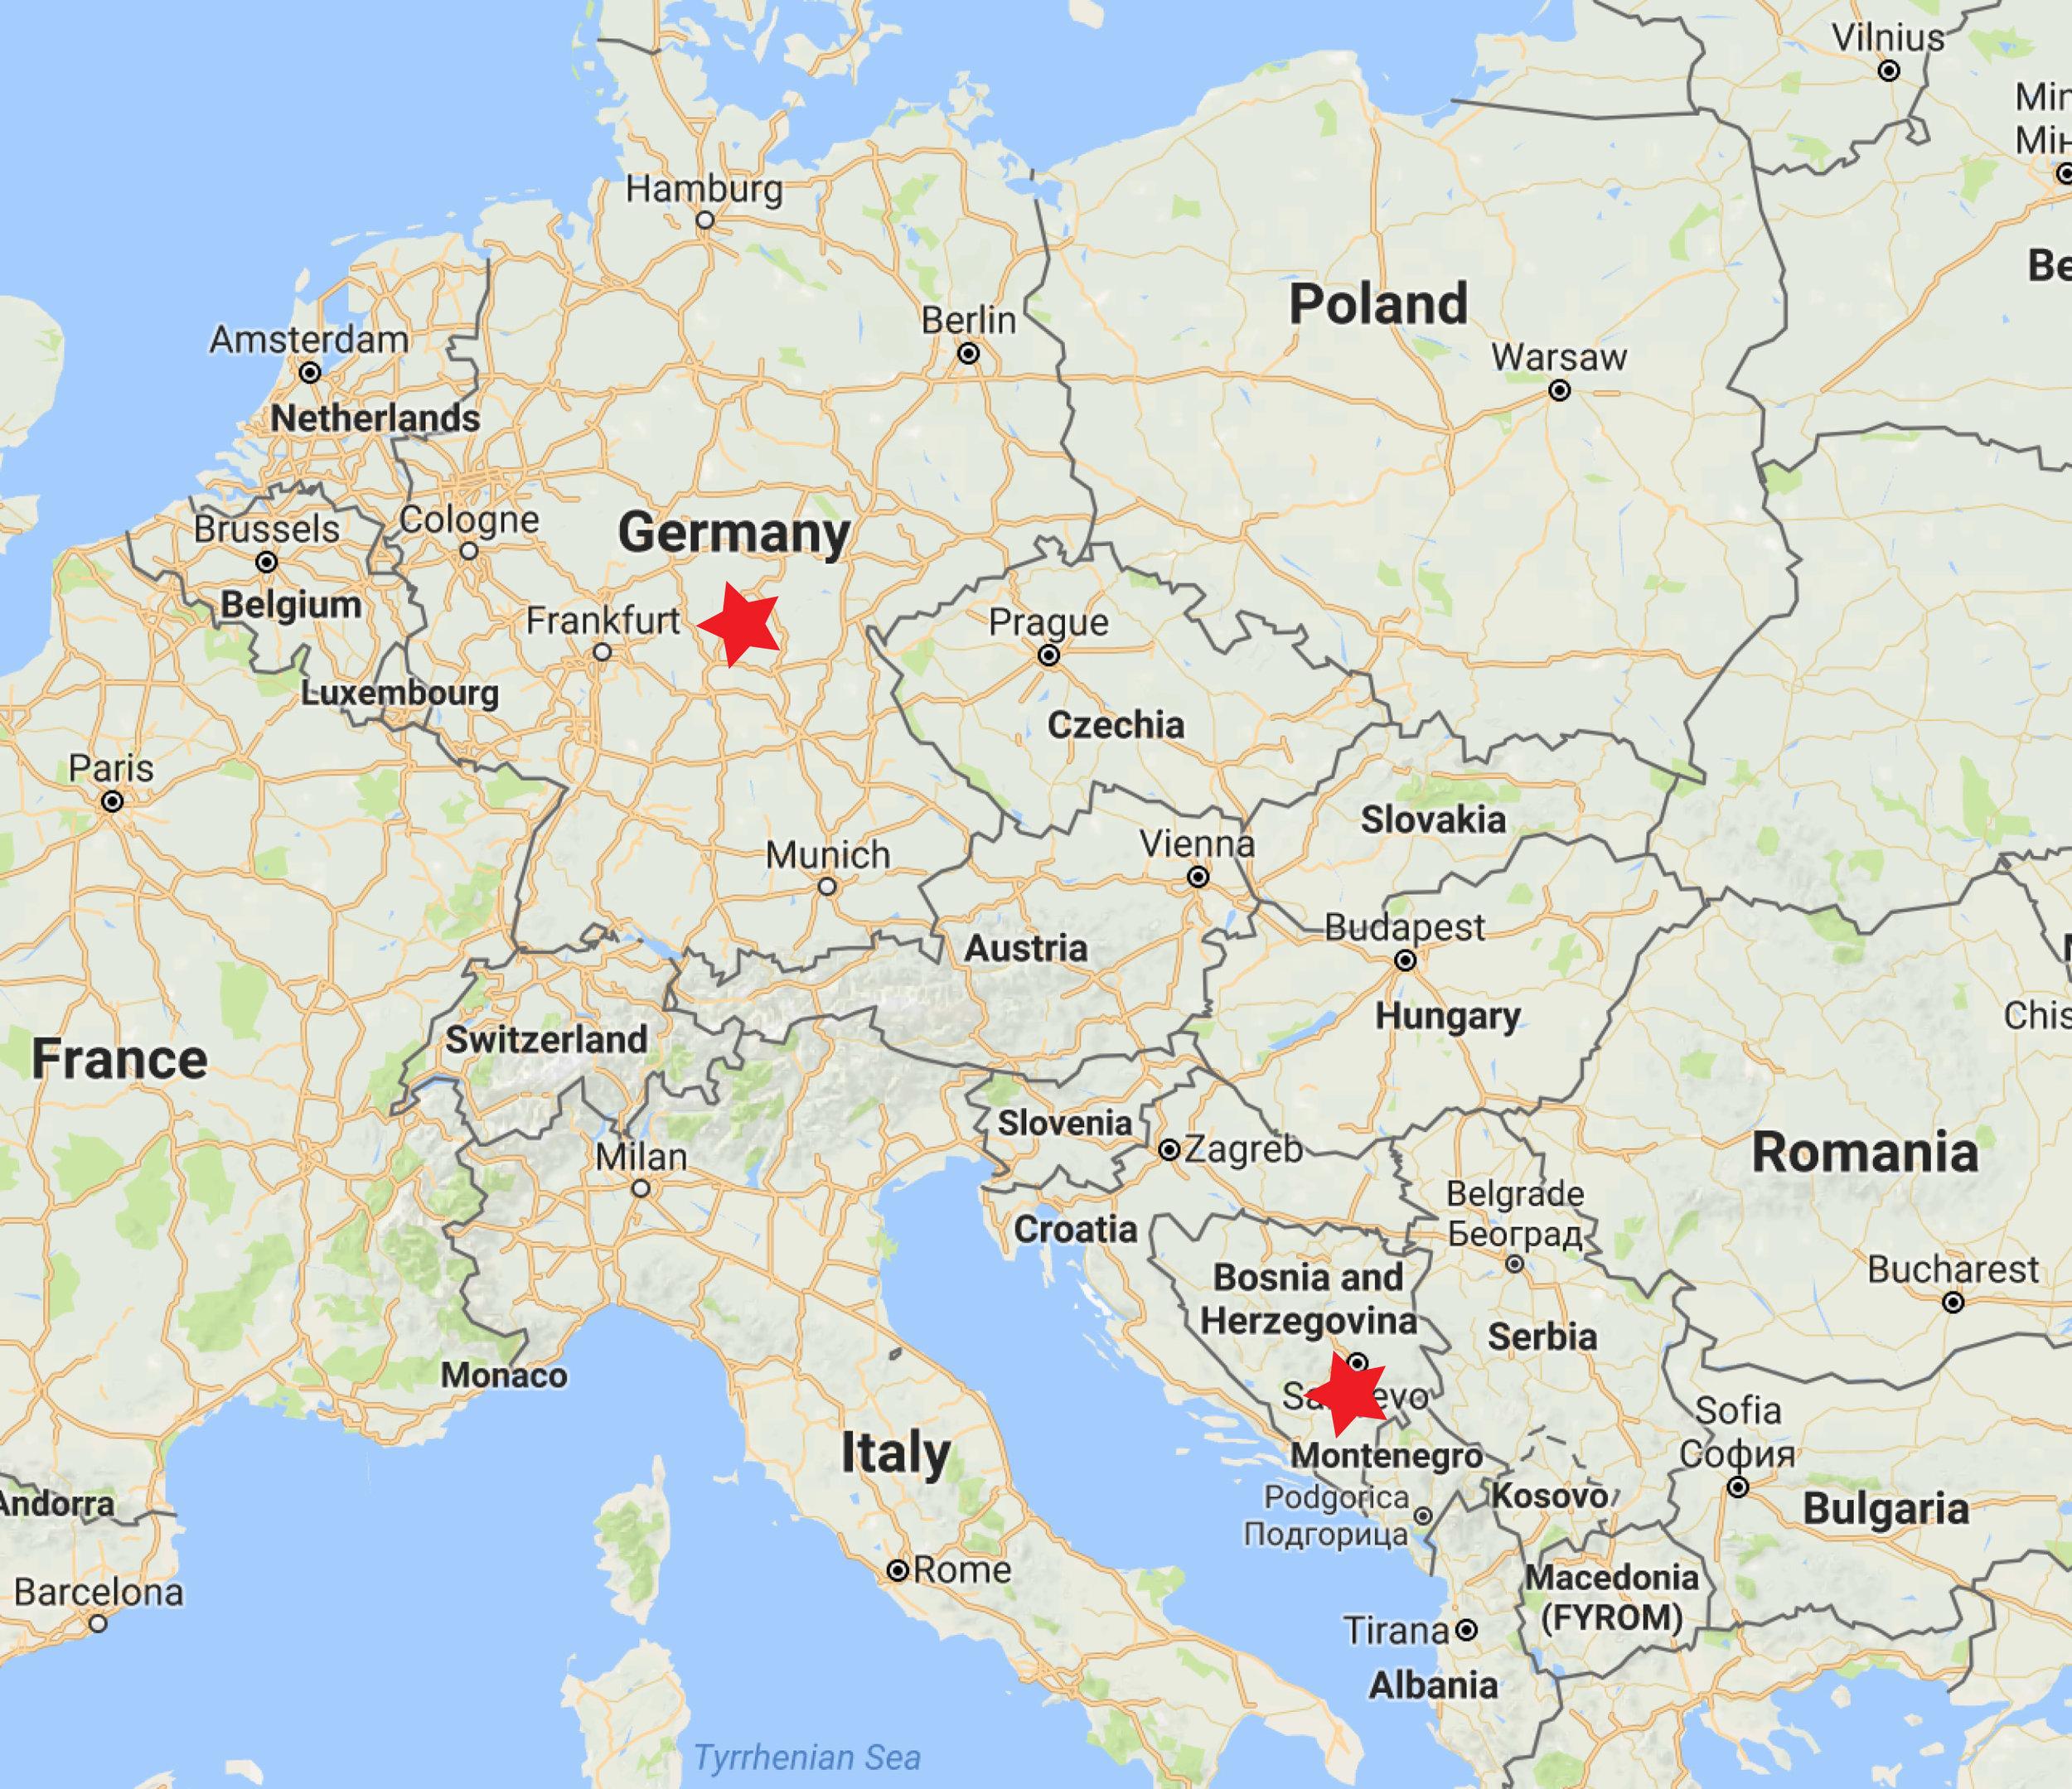 Germany-&-Bosnia.jpg